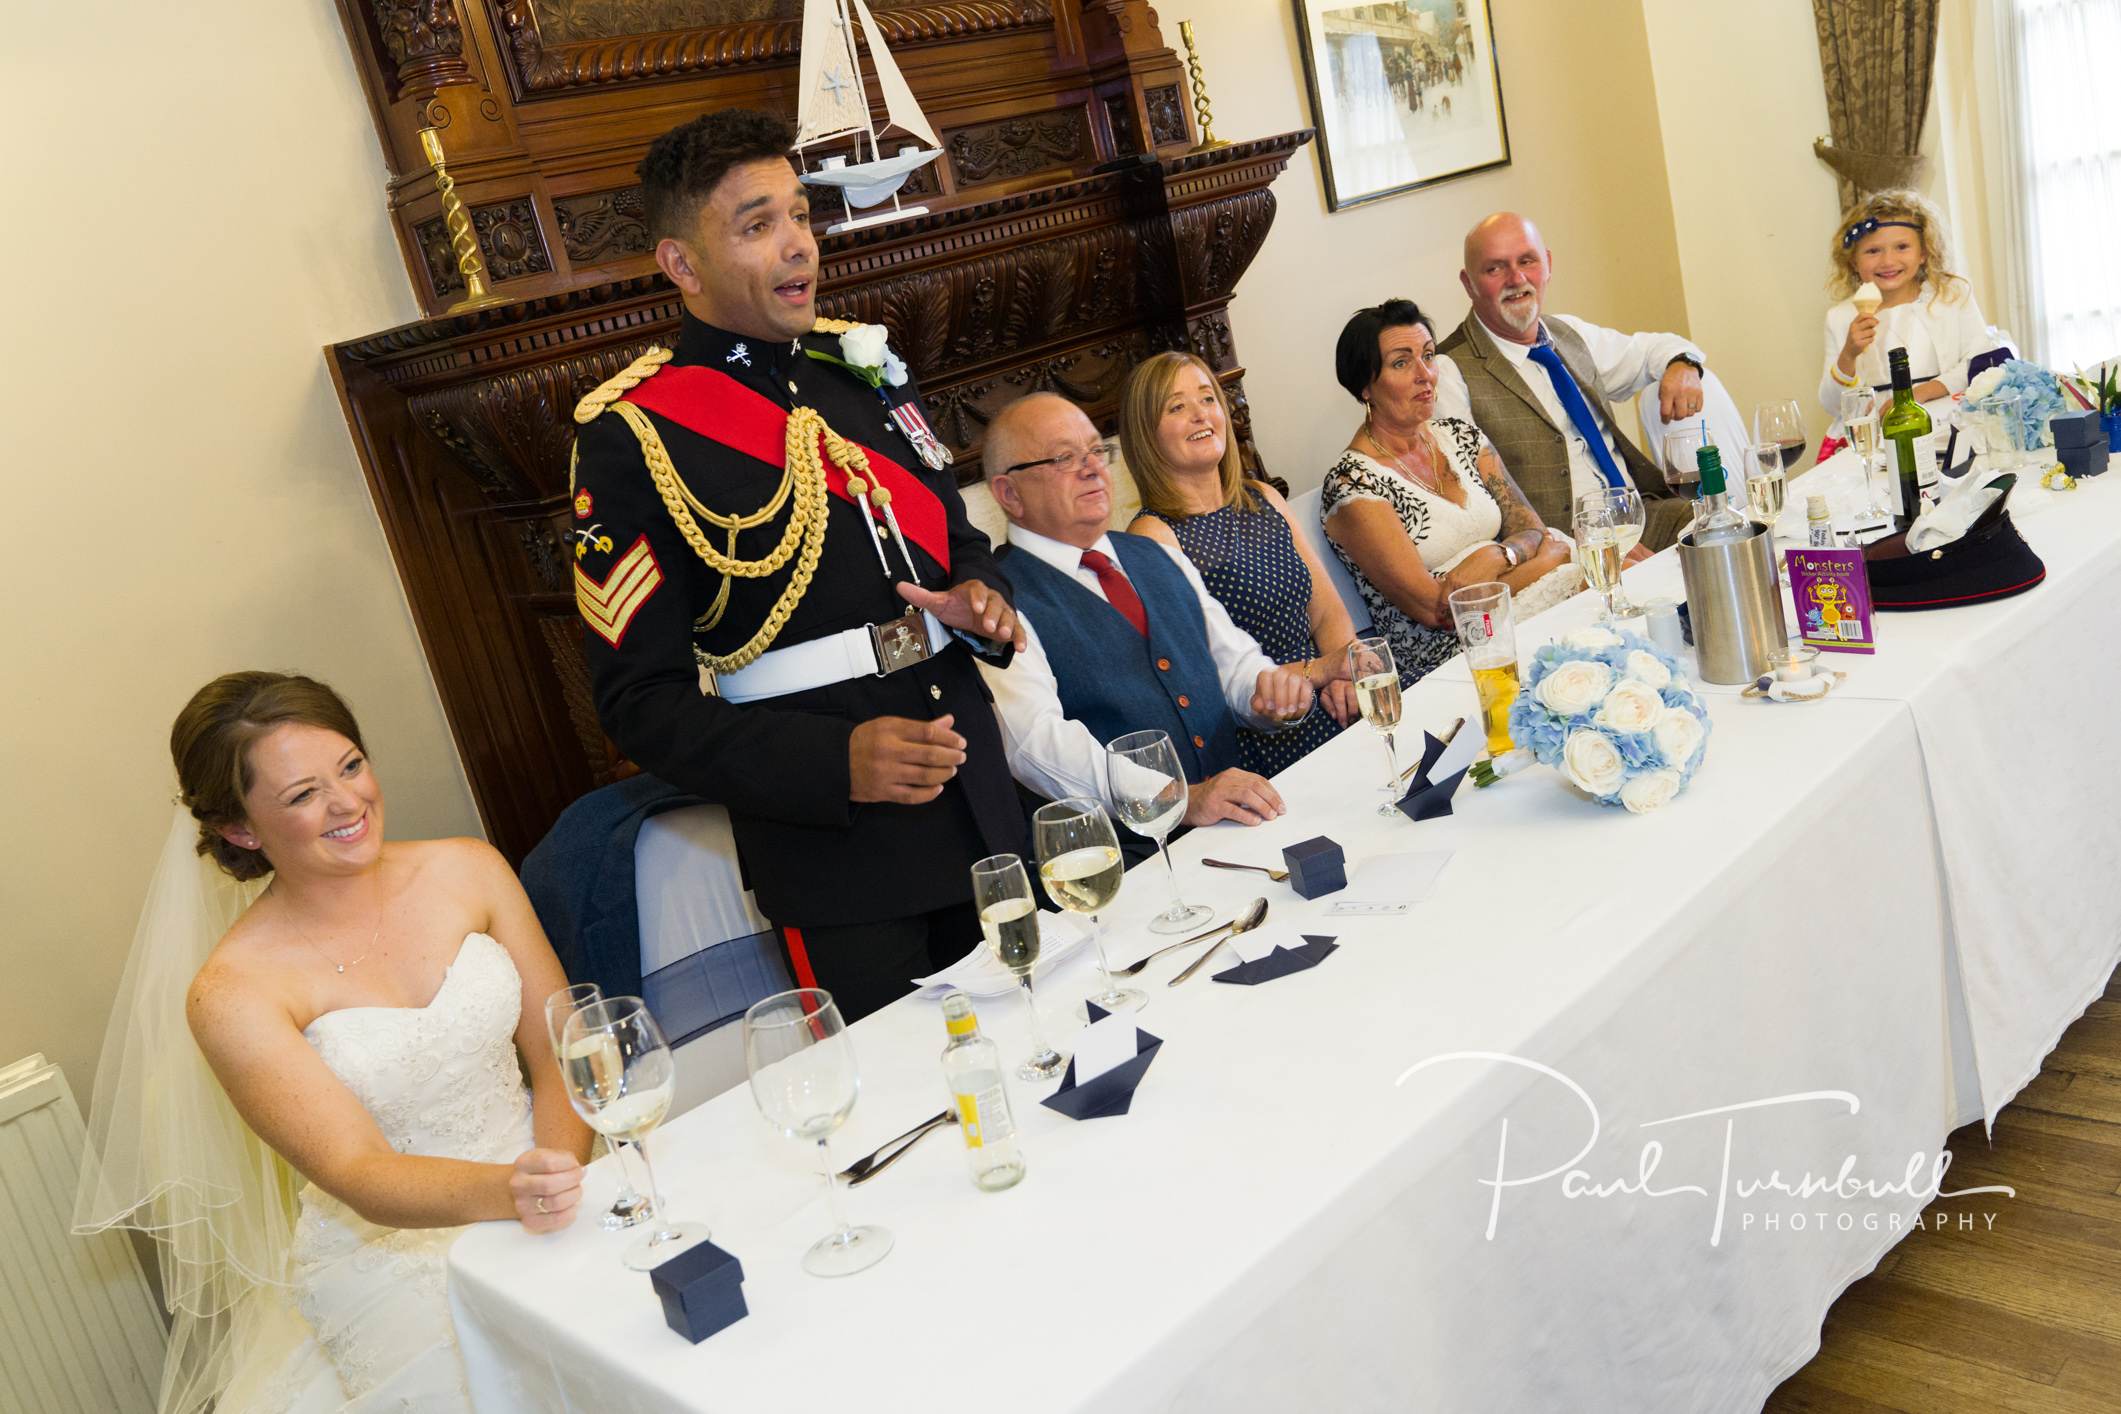 wedding-photographer-south-dalton-walkington-yorkshire-emma-james-063.jpg